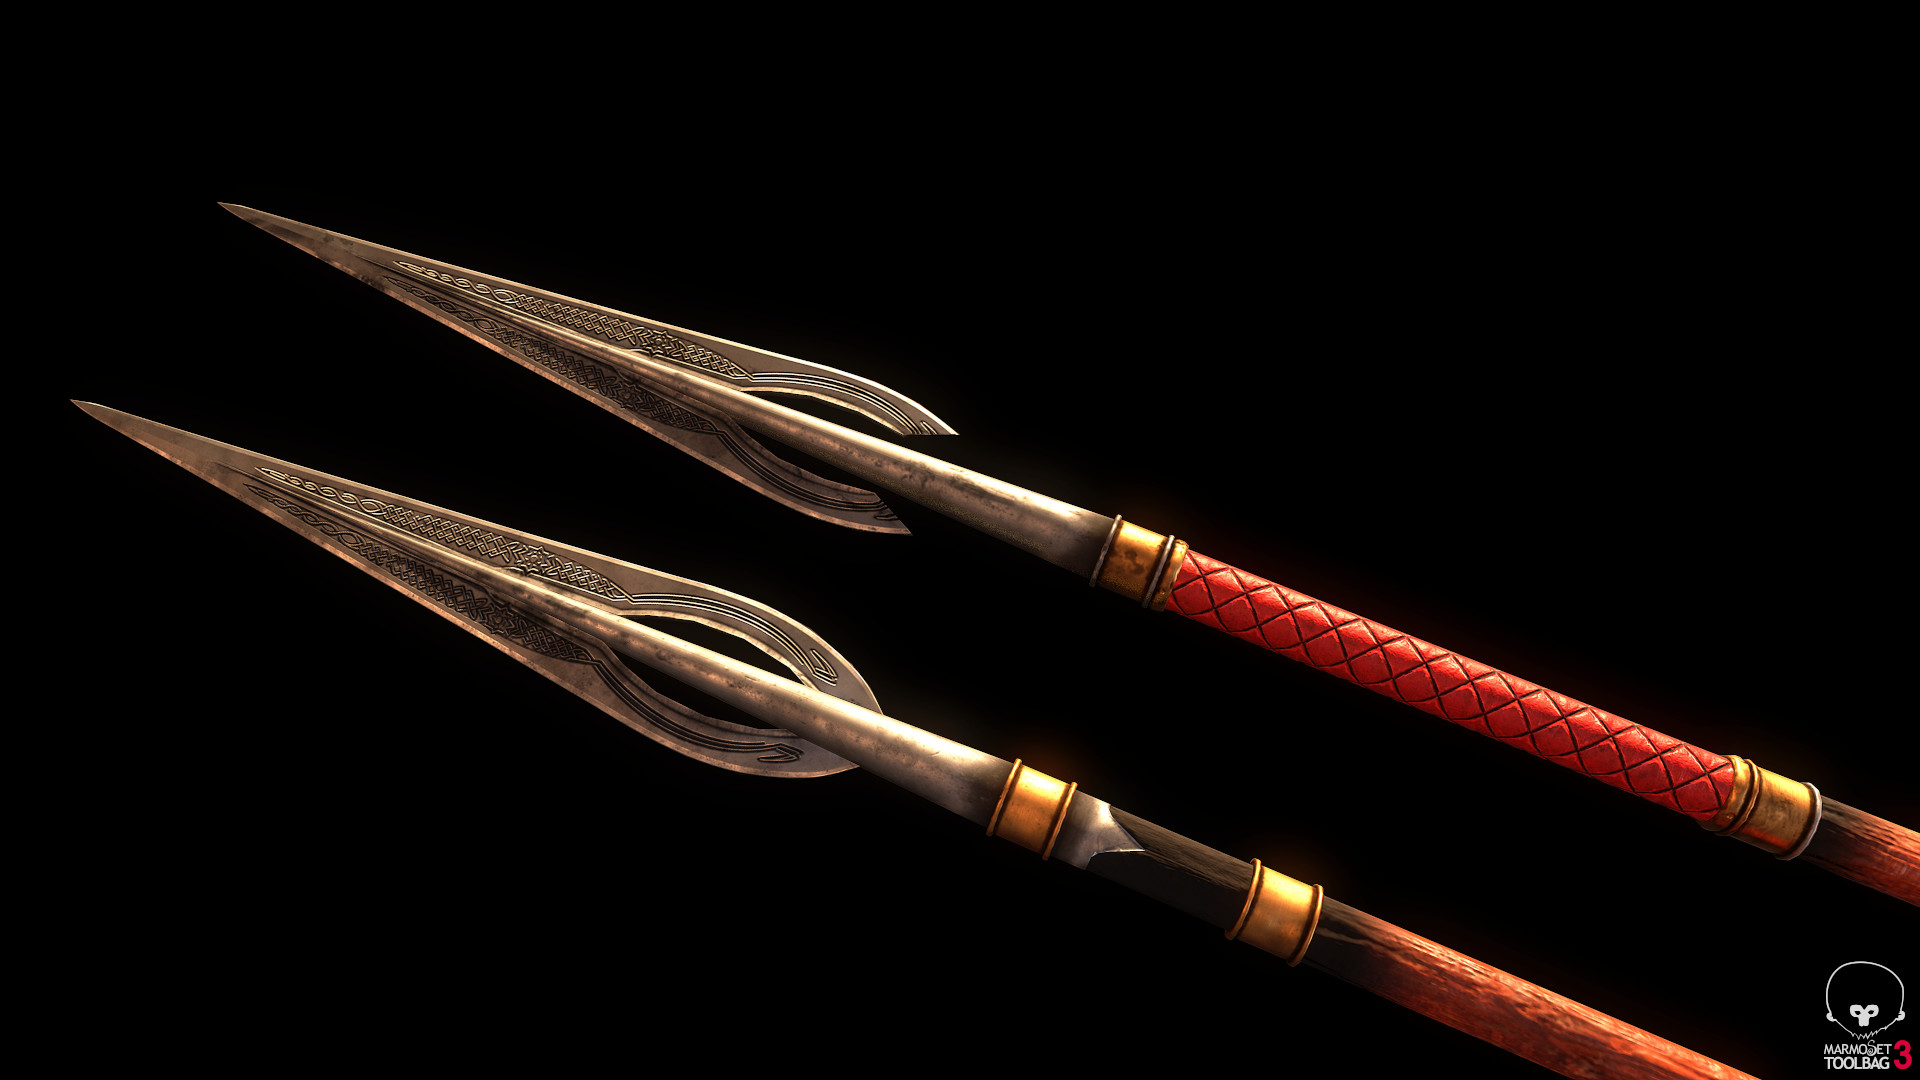 Bela csampai s4h rohan spear ornate 01 render mt 03